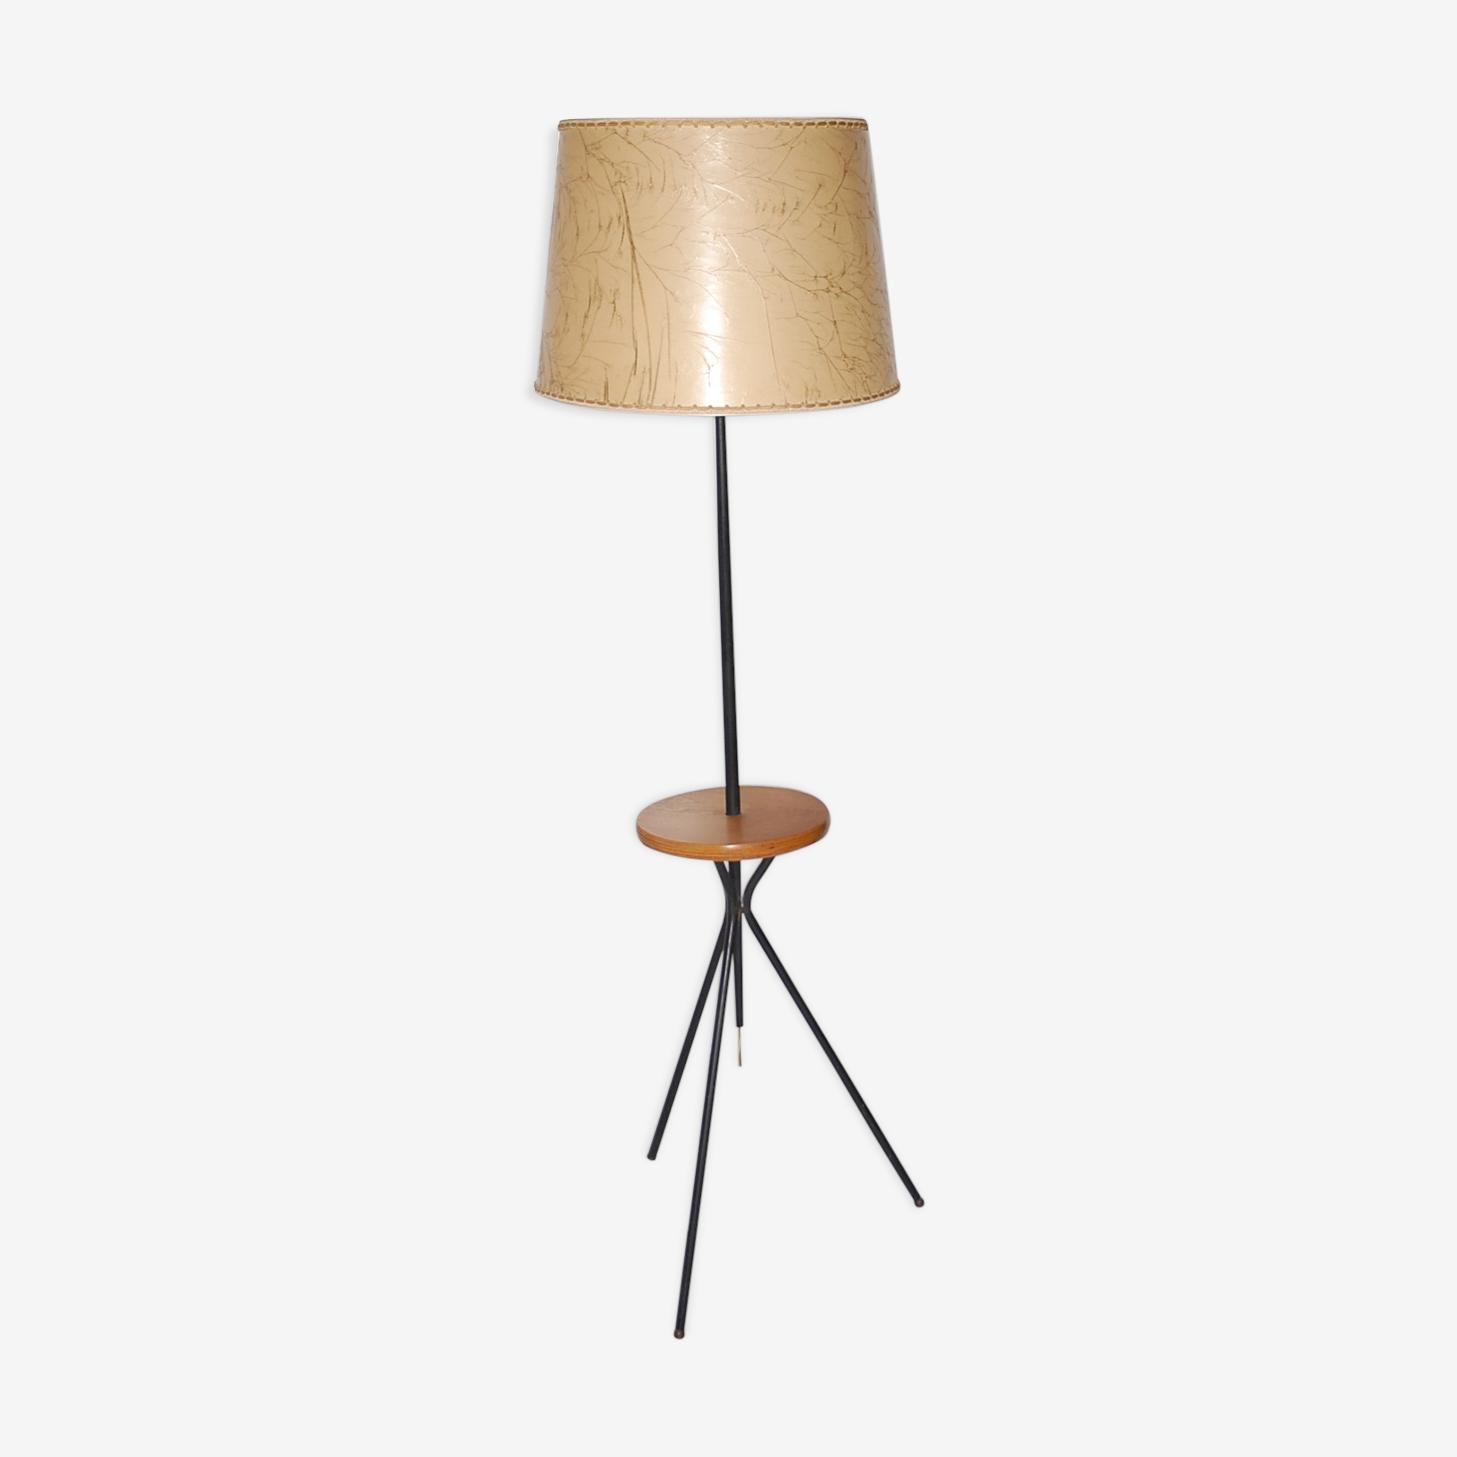 Floor lamp tripod years 50/60